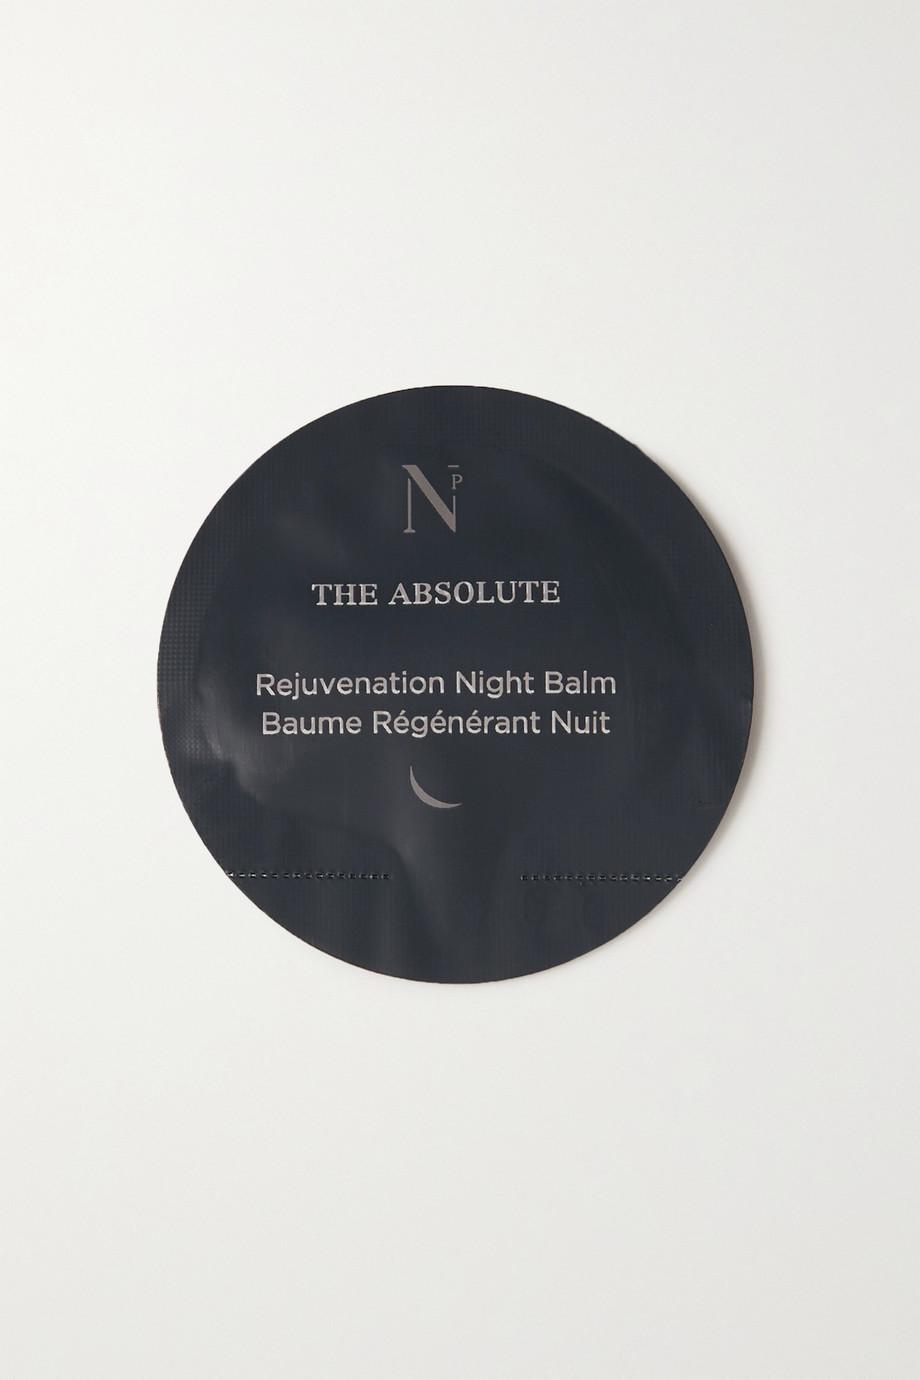 Noble Panacea The Absolute Rejuvenation Night Balm Refill, 30 x 0,8 ml – Nachüll-Nachtcreme